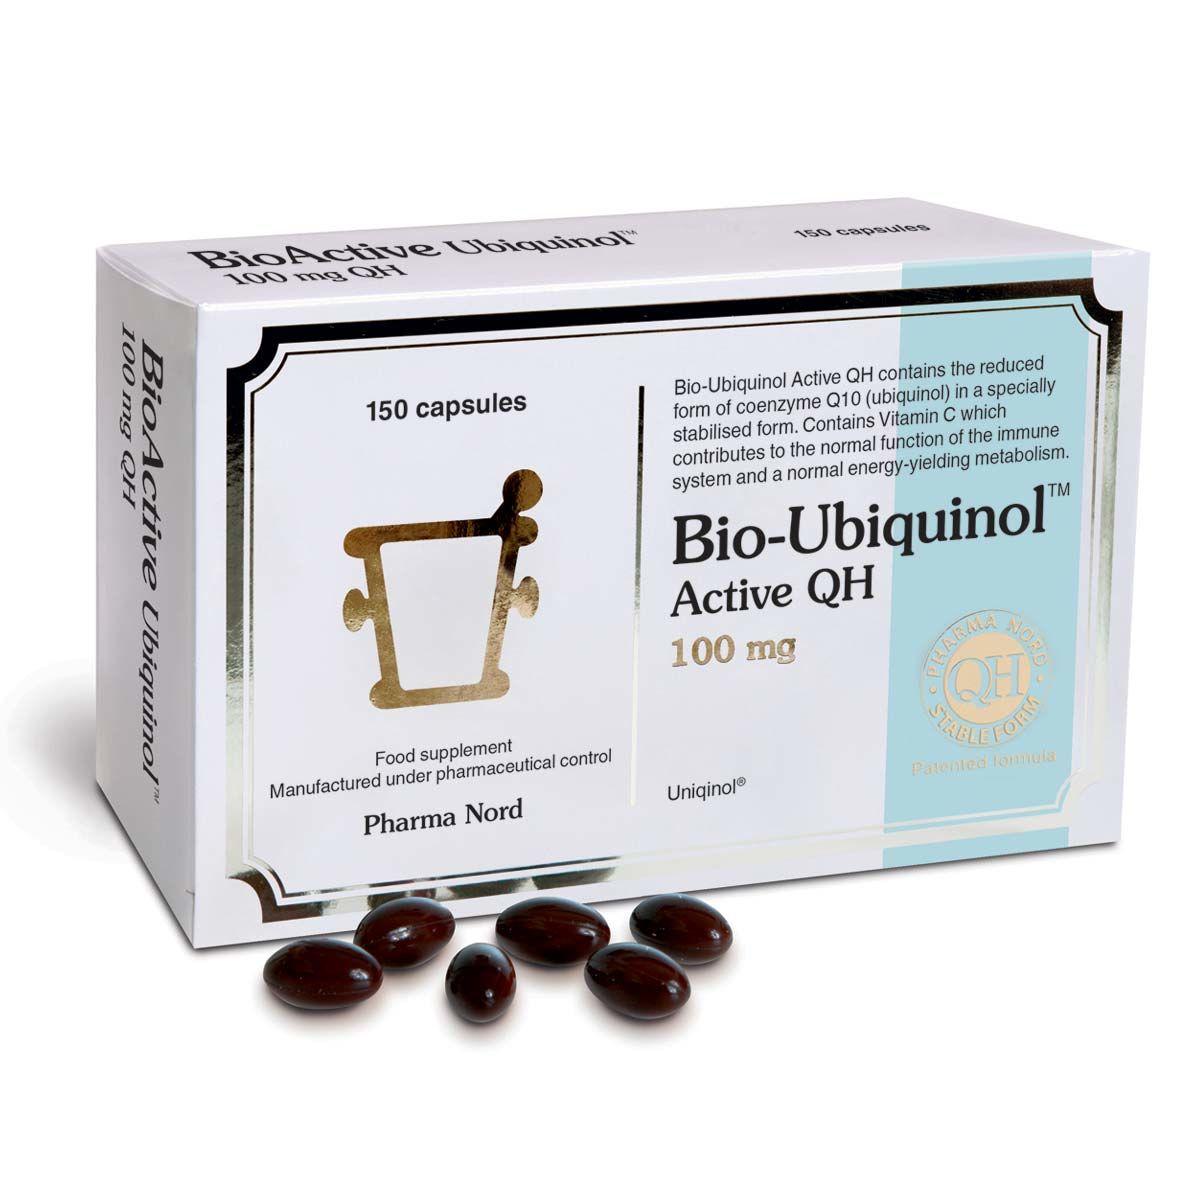 Bio-Ubiquinol Active QH 100mg 150's